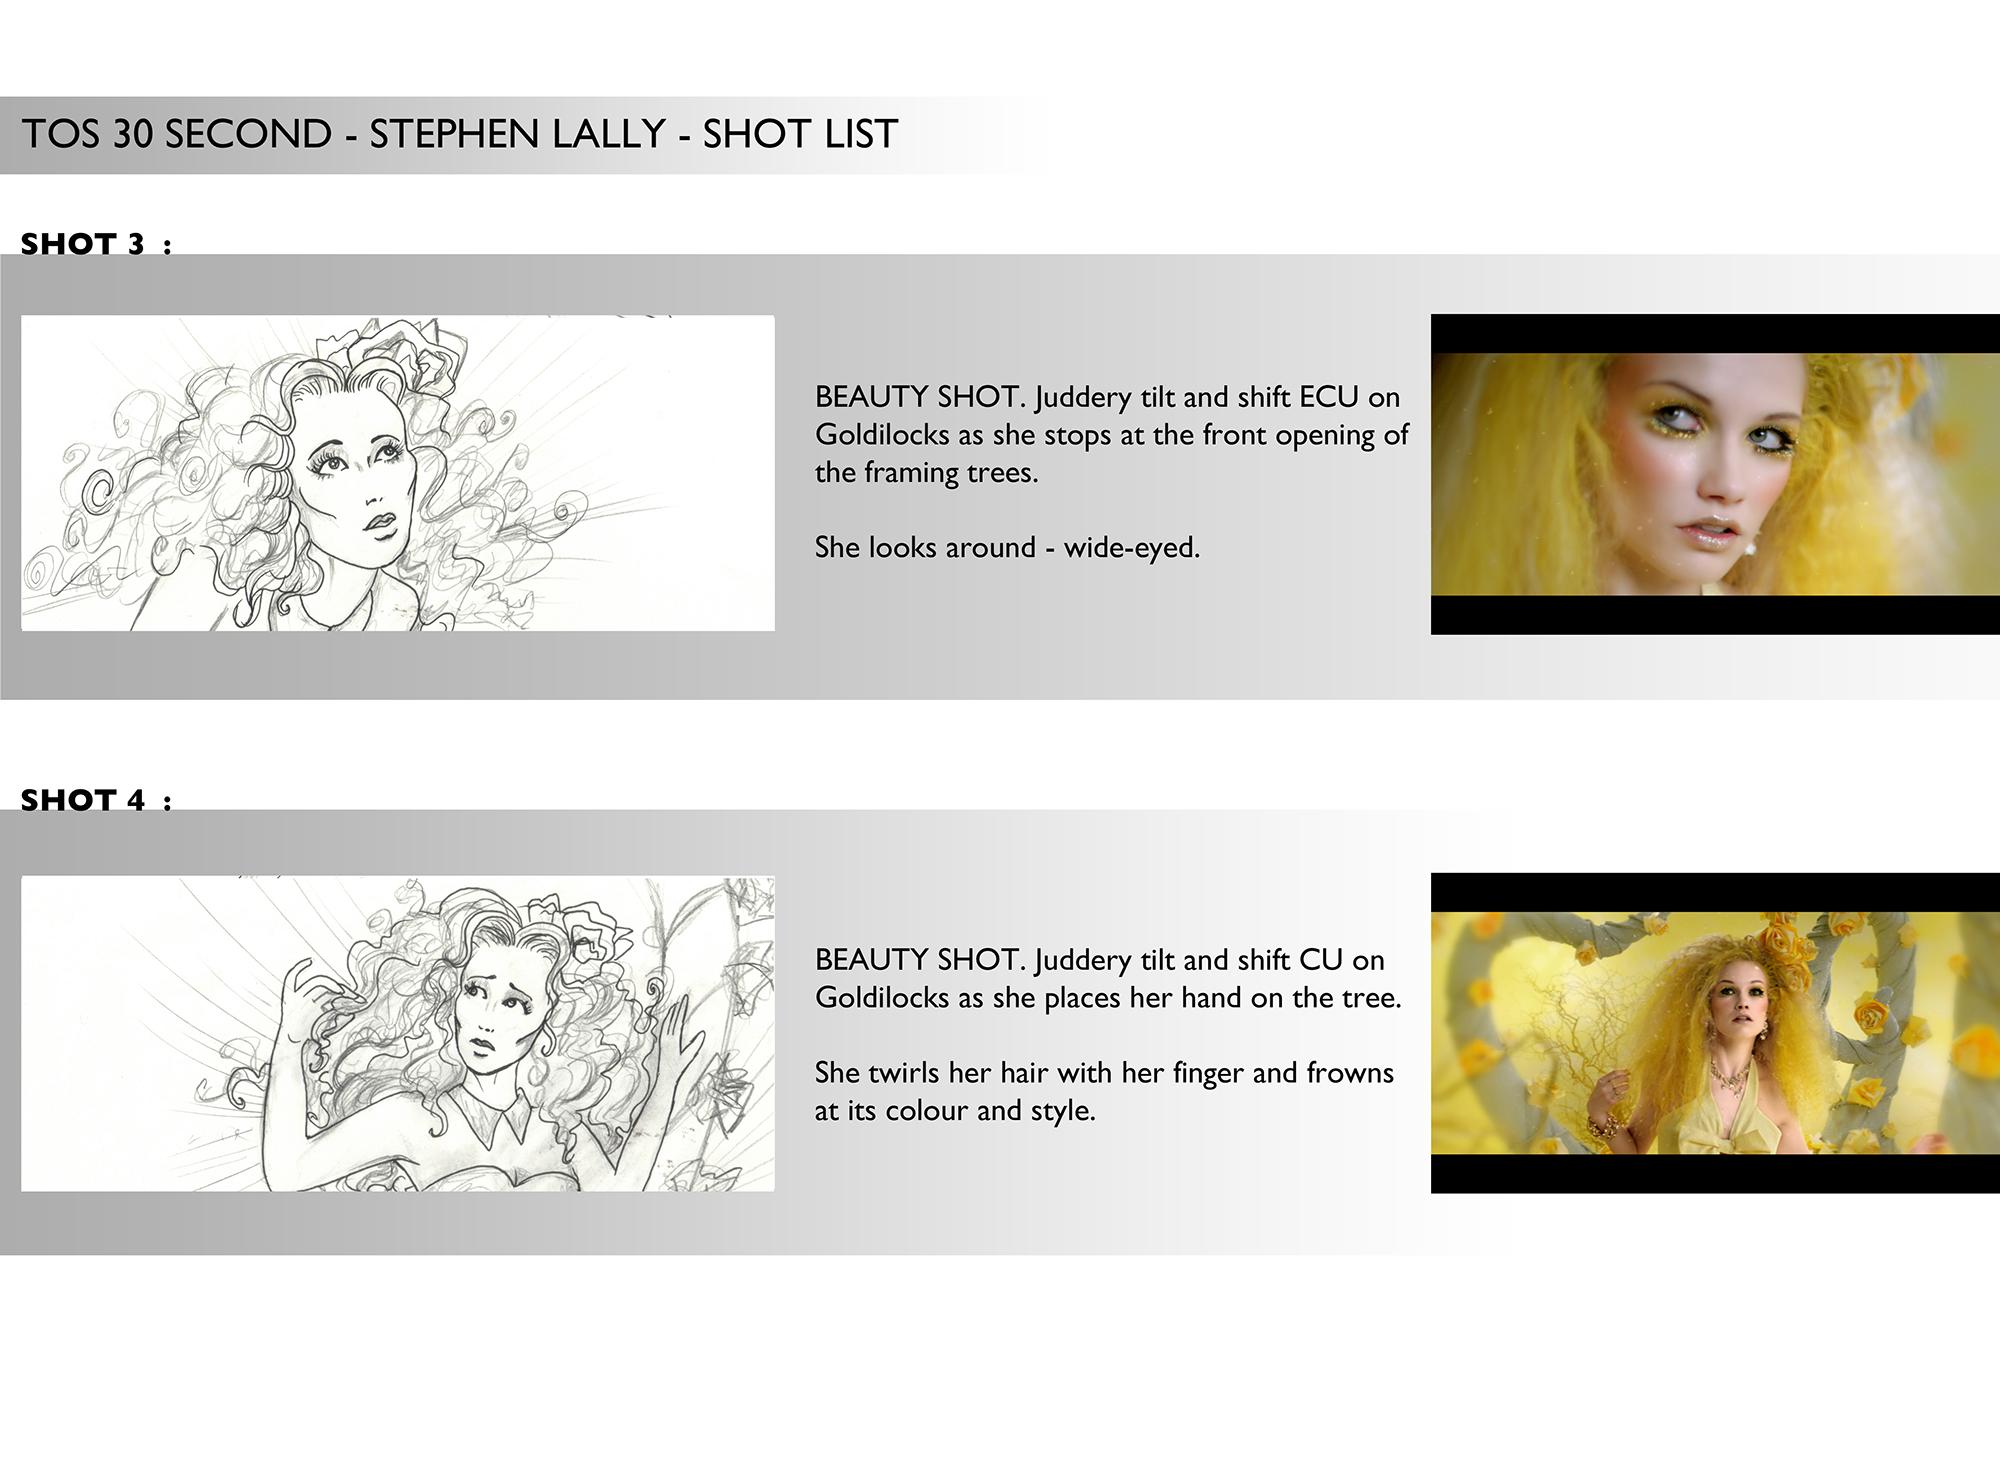 stephen_lally_storyboard_artwork_11.png